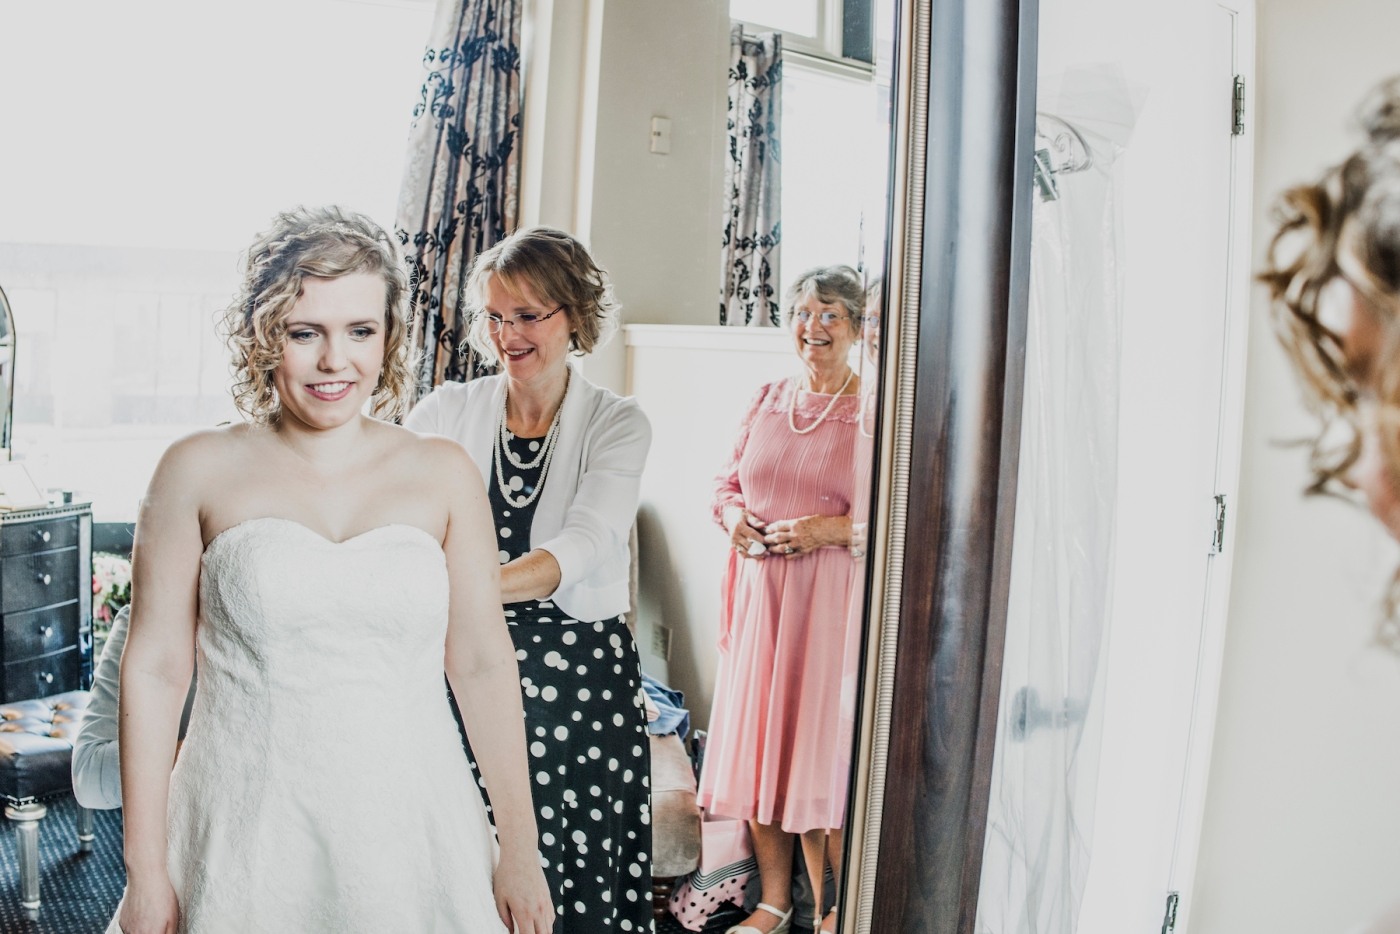 DSC_1870Everett_Wedding_Ballroom_Jane_Speleers_photography_Rachel_and_Edmund_Getting_ready_2017